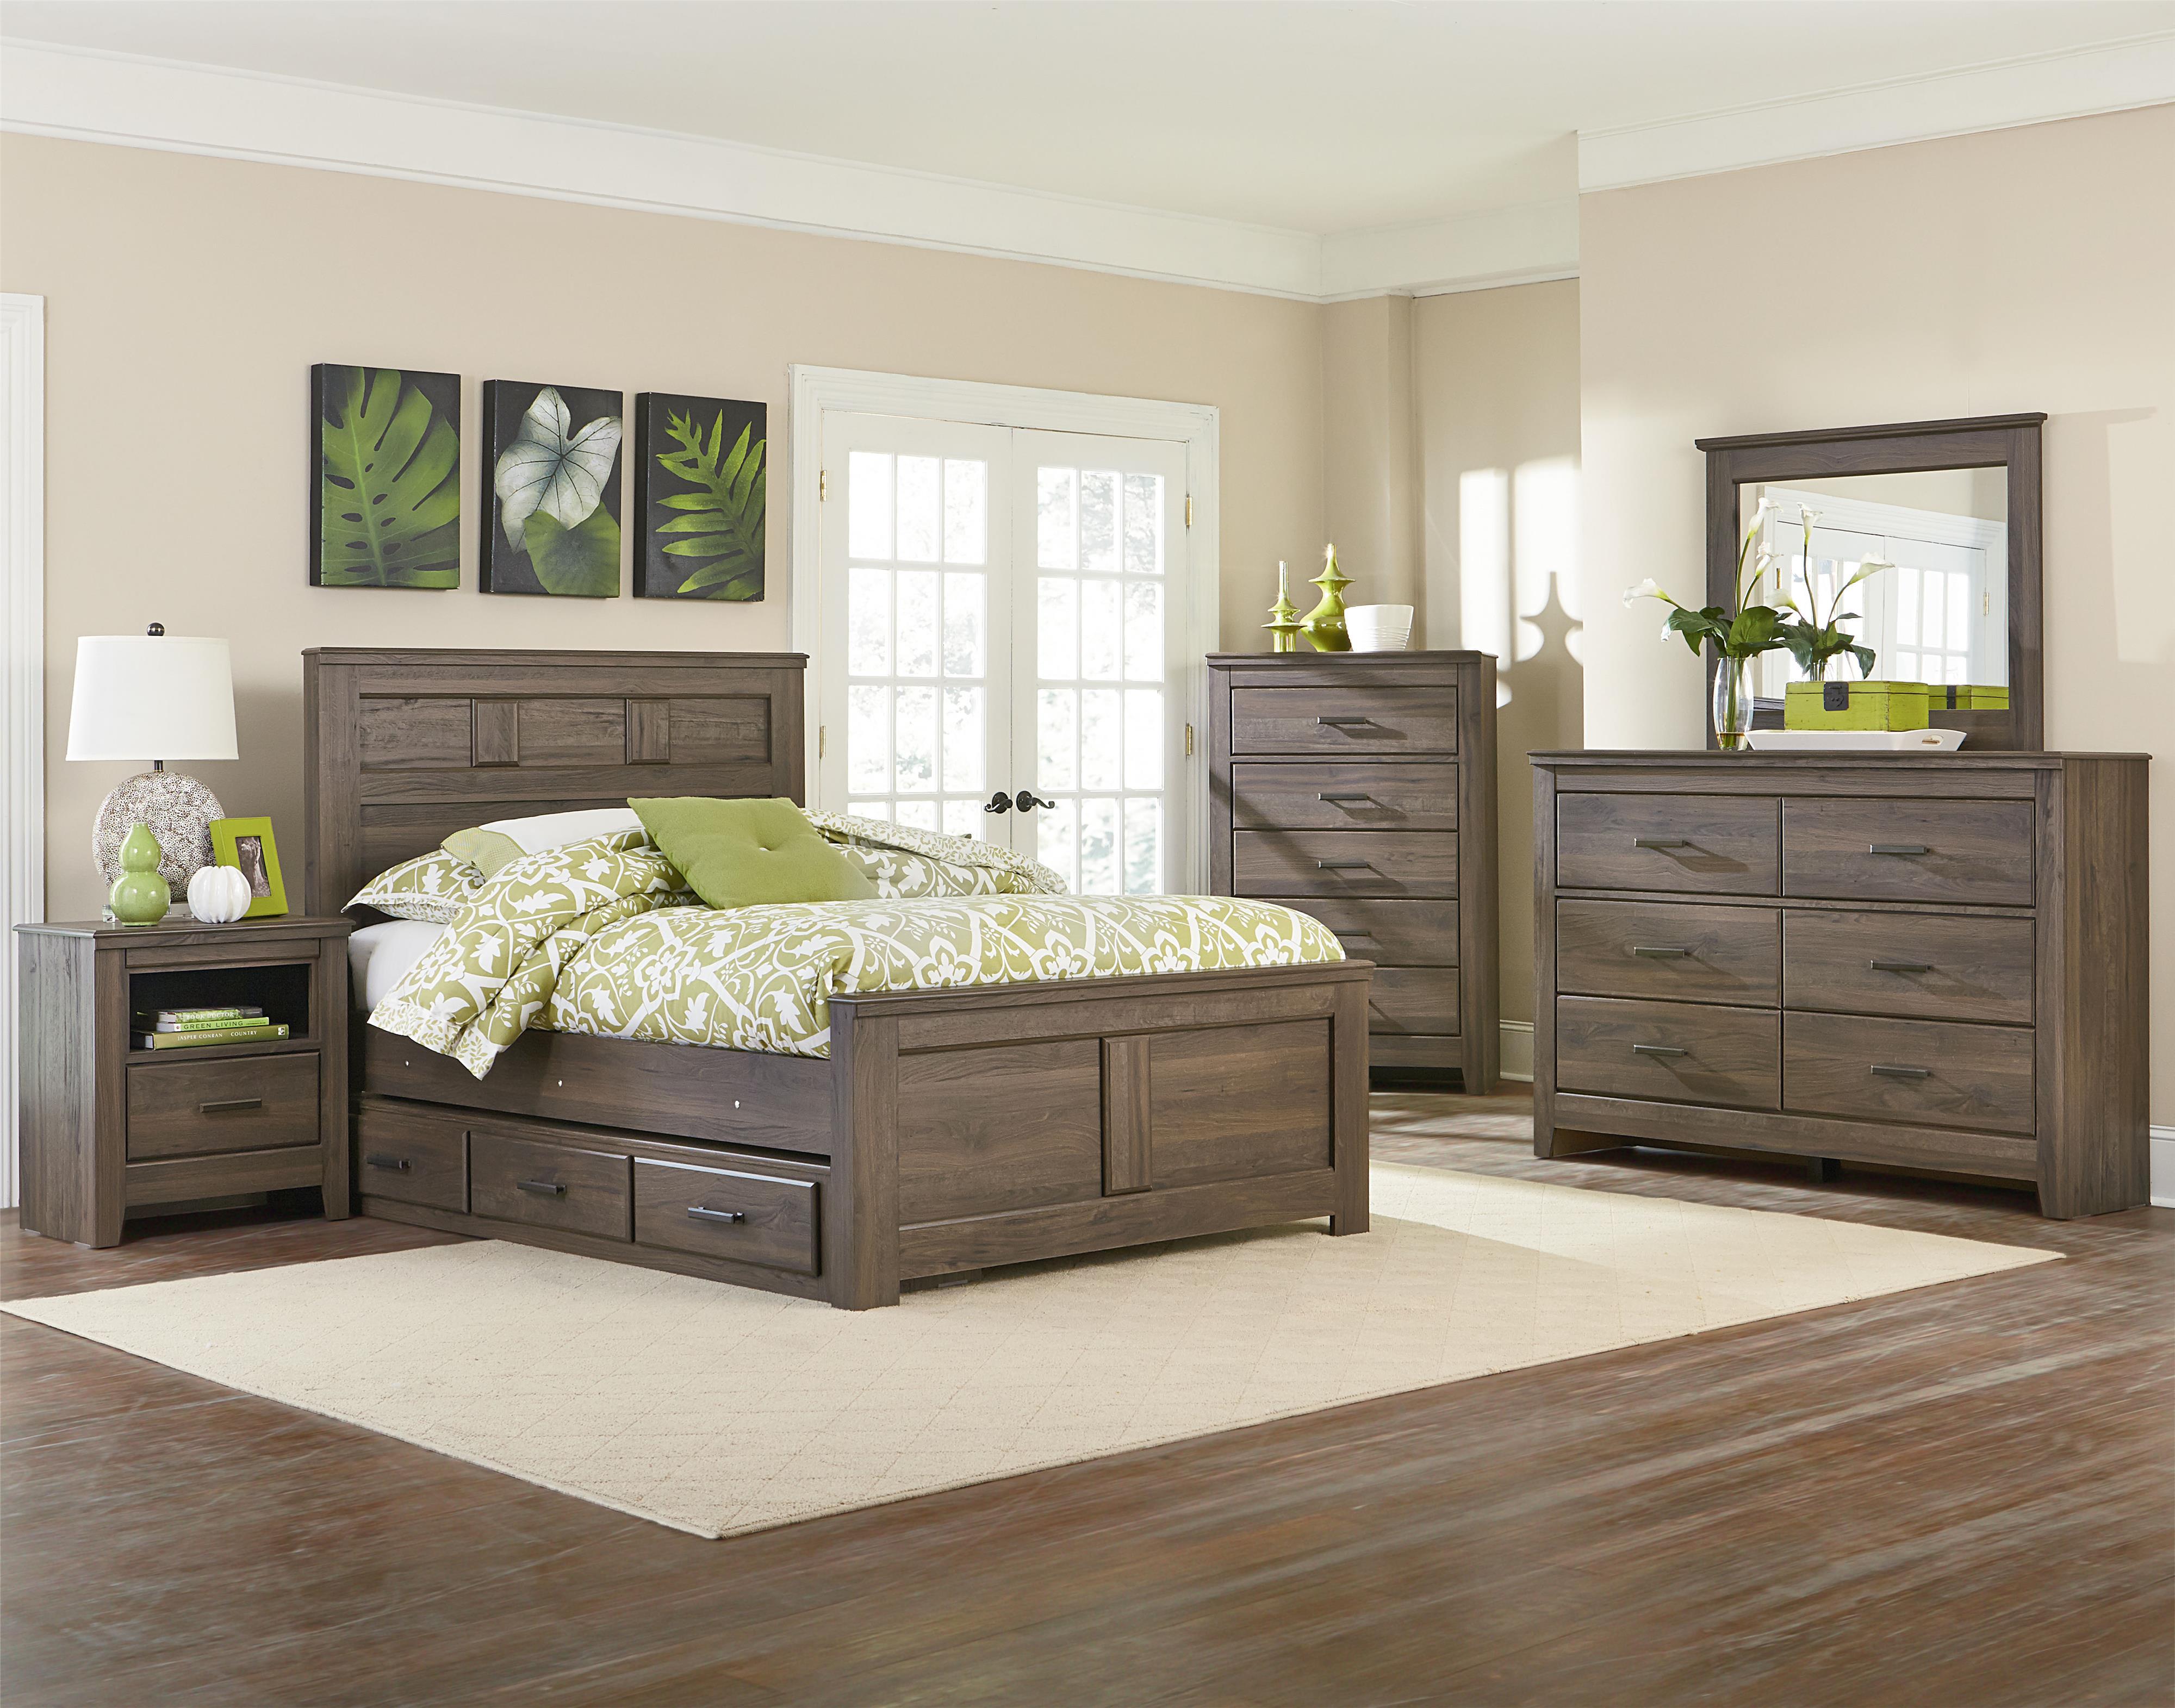 Standard Furniture Hayward Twin Bedroom Group - Item Number: 56510 T Bedroom Group 4